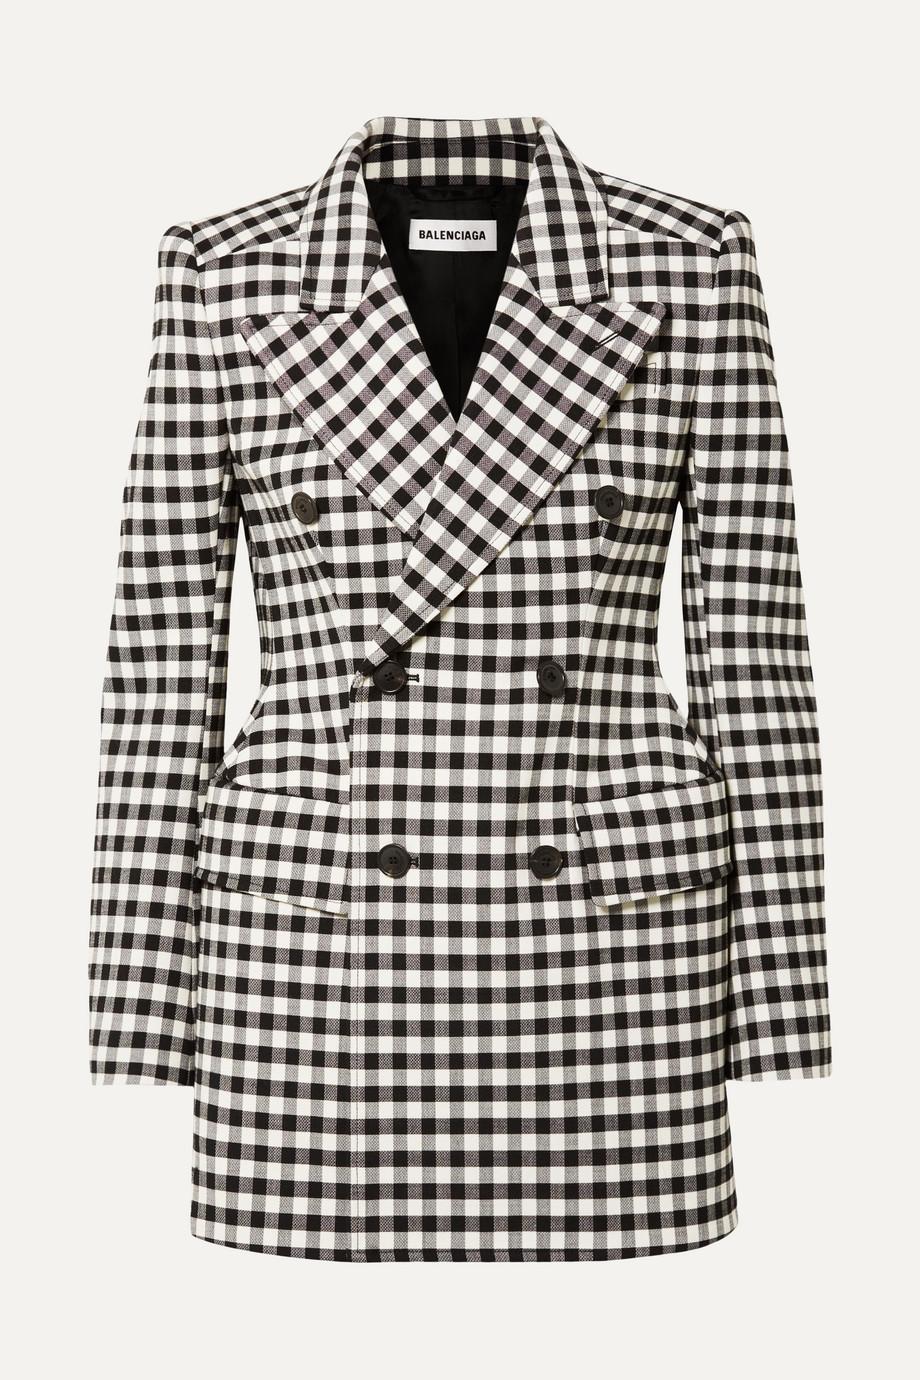 Exact Product: Hourglass gingham woven blazer, Brand: Balenciaga, Available on: net-a-porter.com, Price: $2990